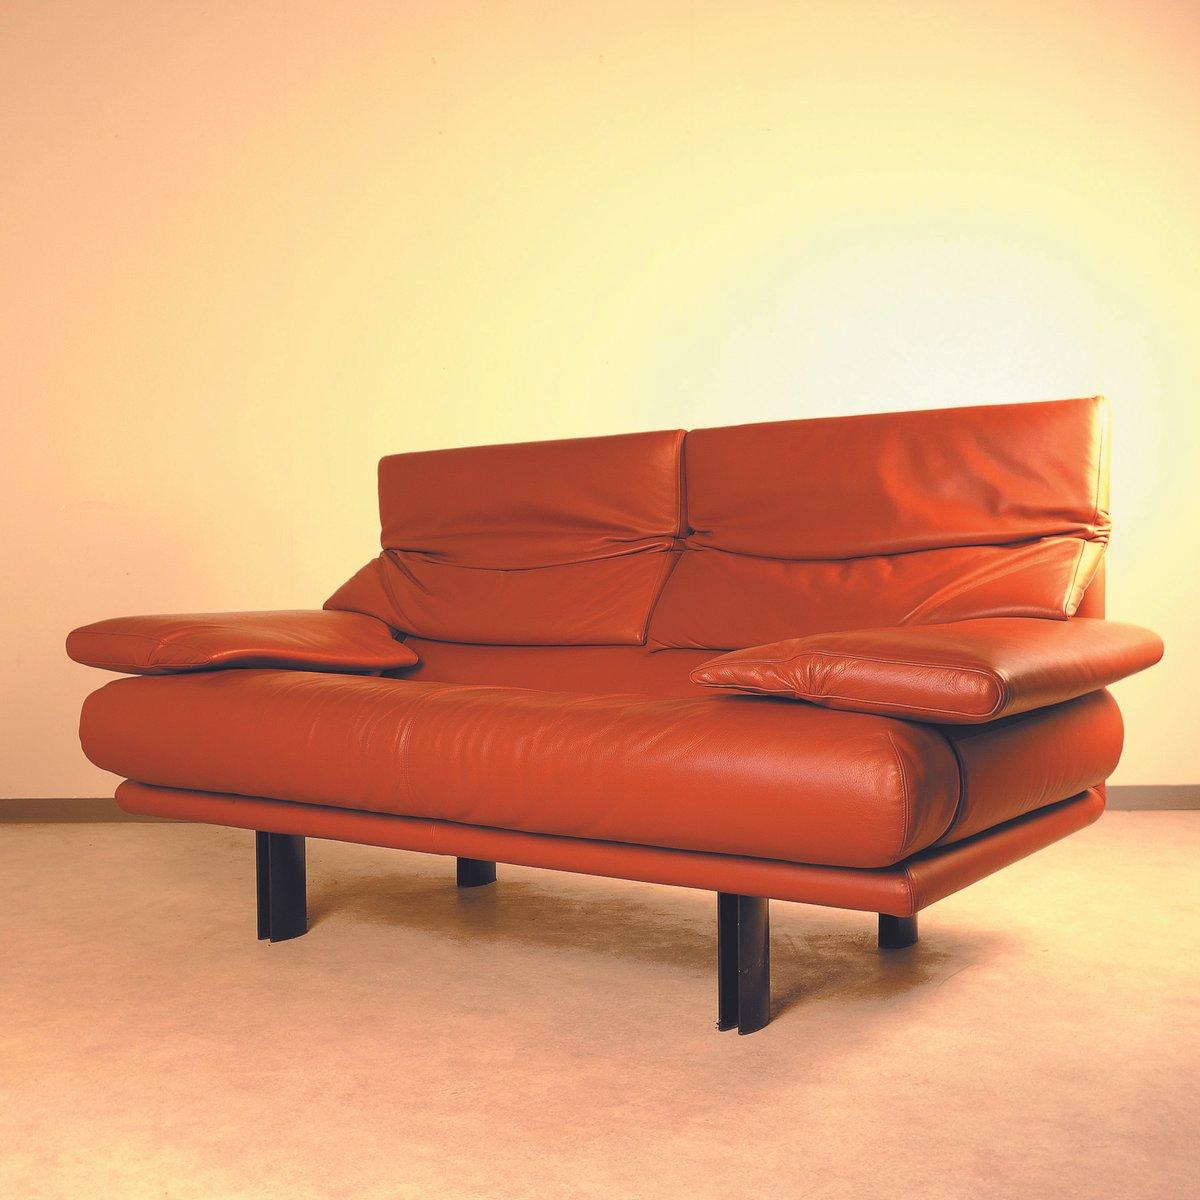 2 Seater Alanda Sofa By Paolo Piva For B B Italia For Sale At Pamono